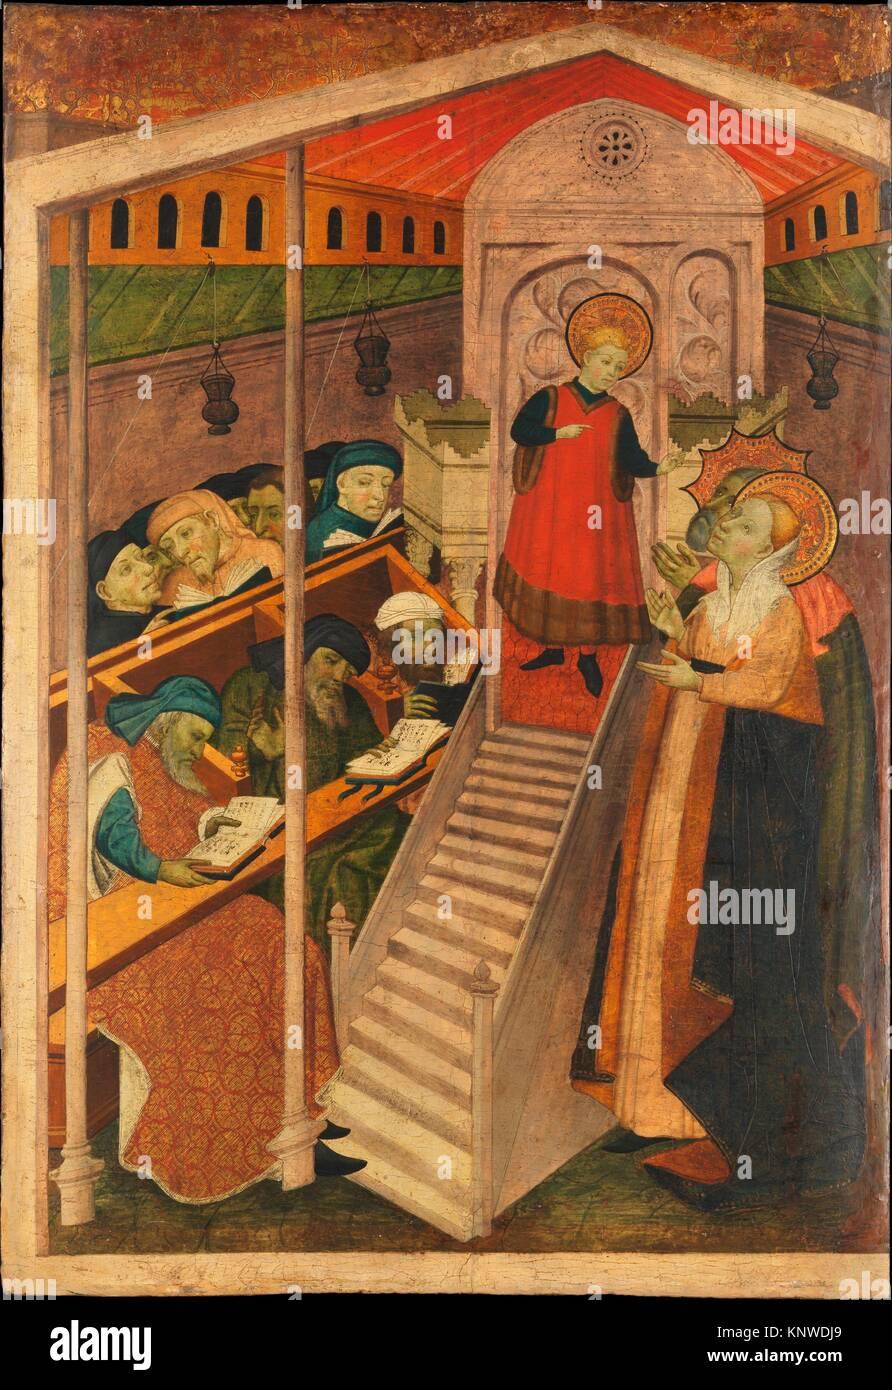 Christ among stock photos christ among stock images alamy for Artiste peintre catalan